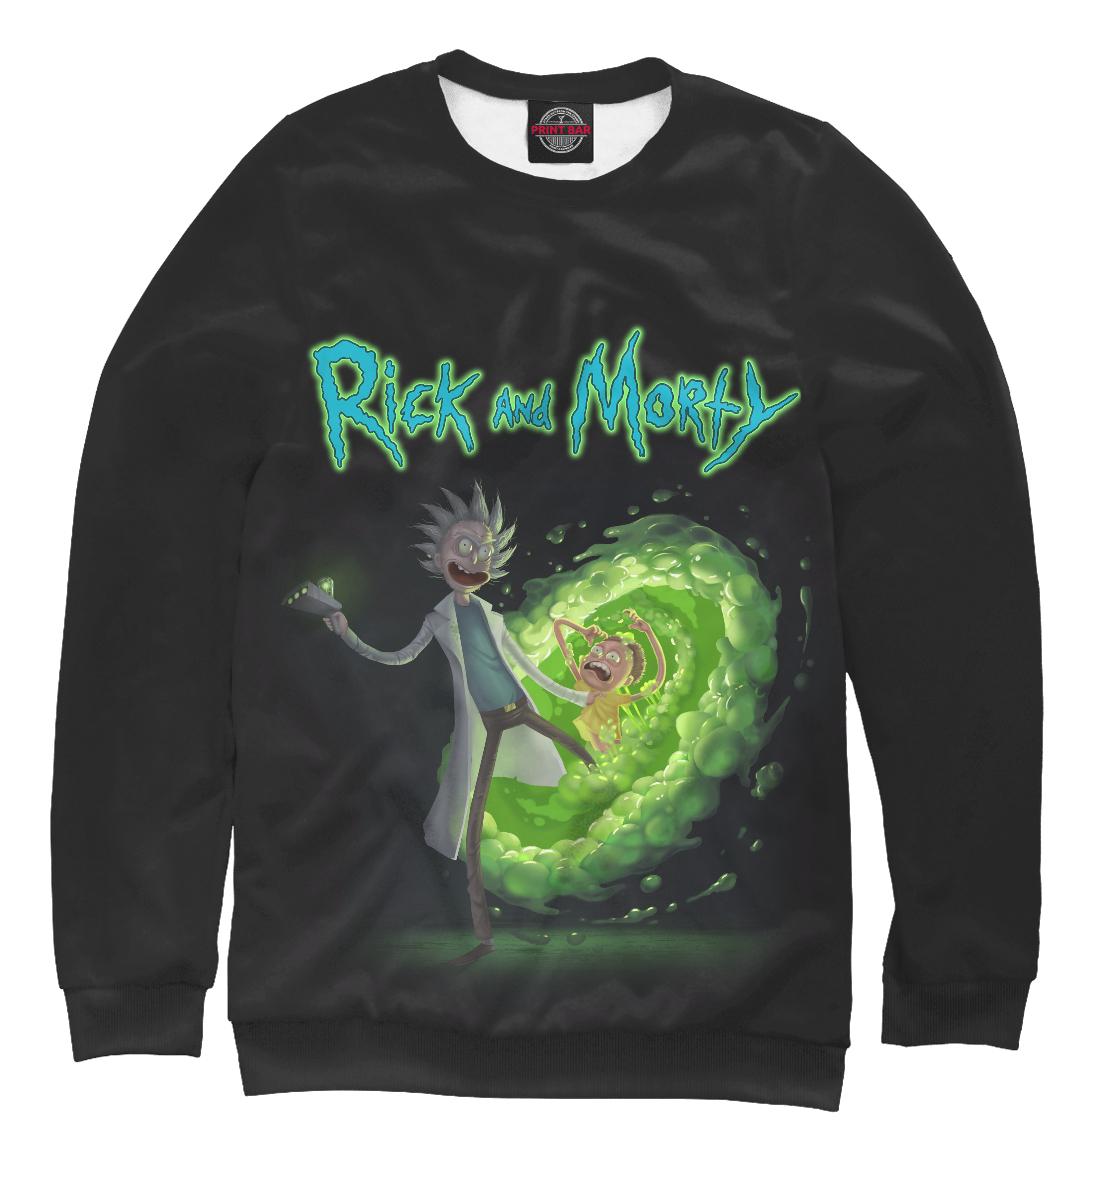 Купить Rick and Morty and 3D Portal, Printbar, Свитшоты, RNM-675402-swi-2